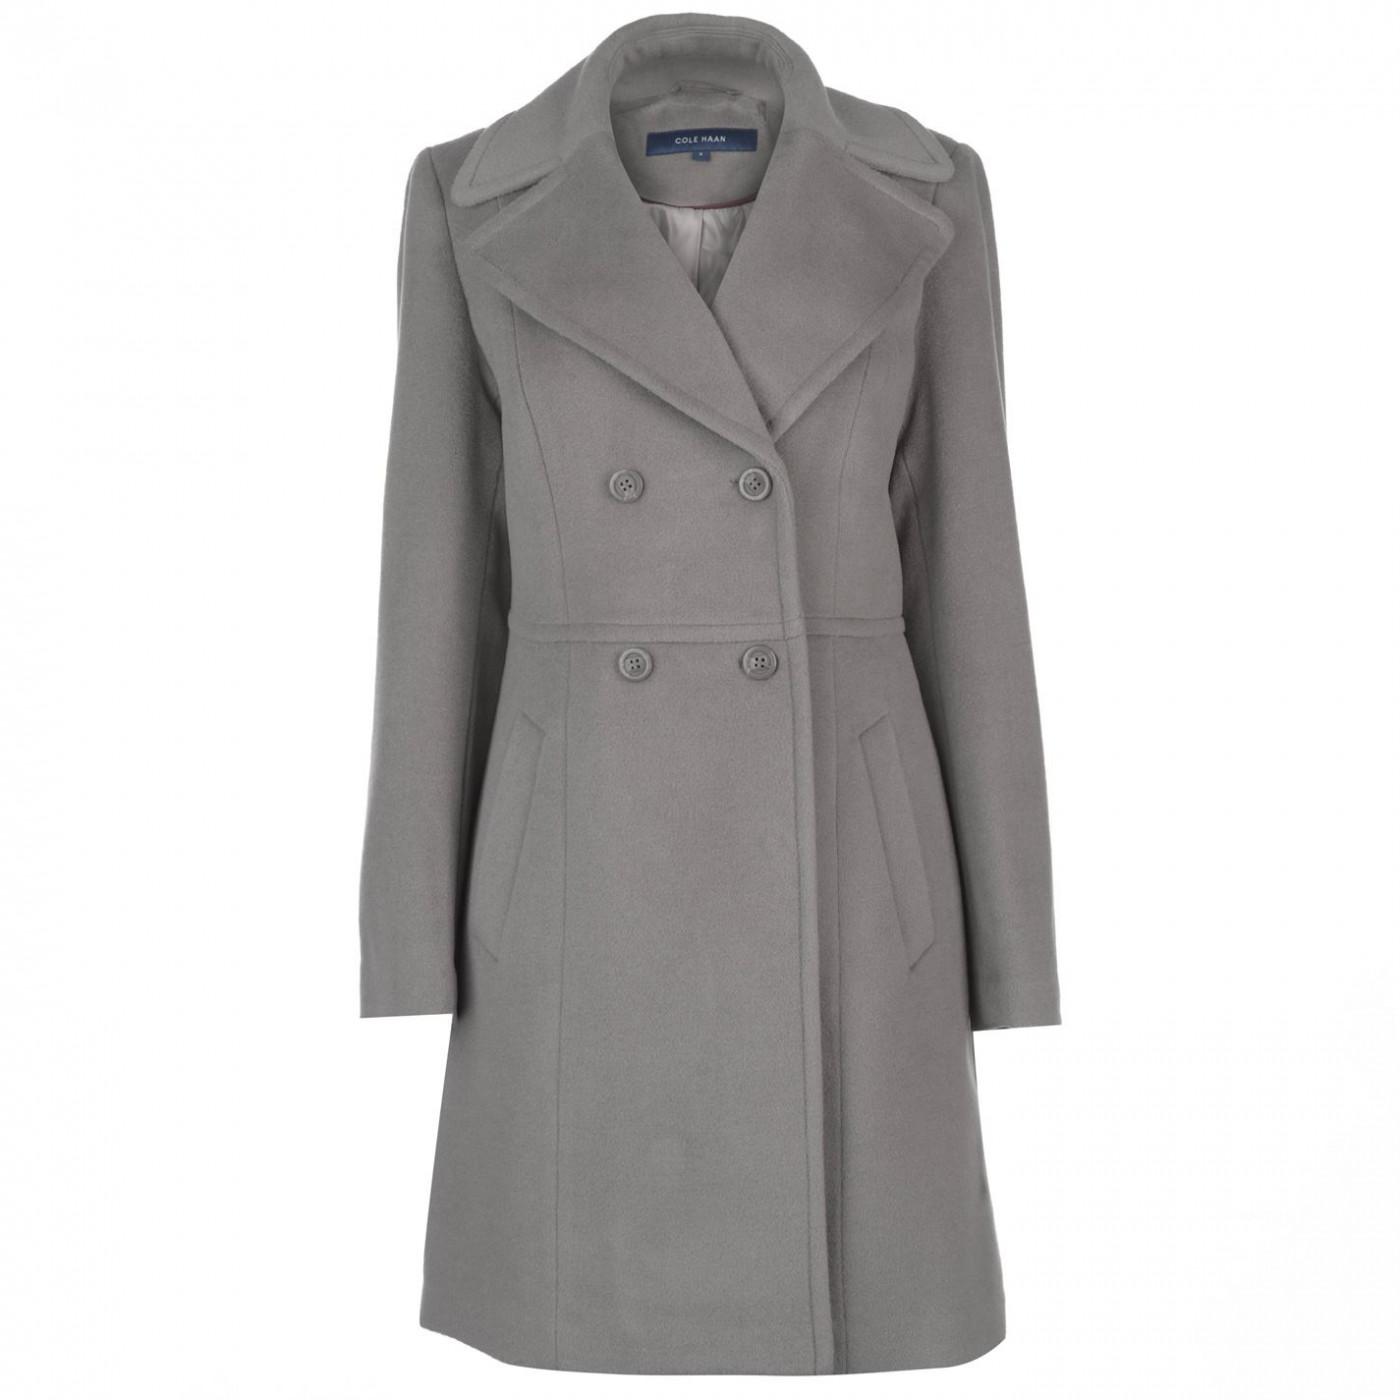 Cole Haan Wool Coat Ladies